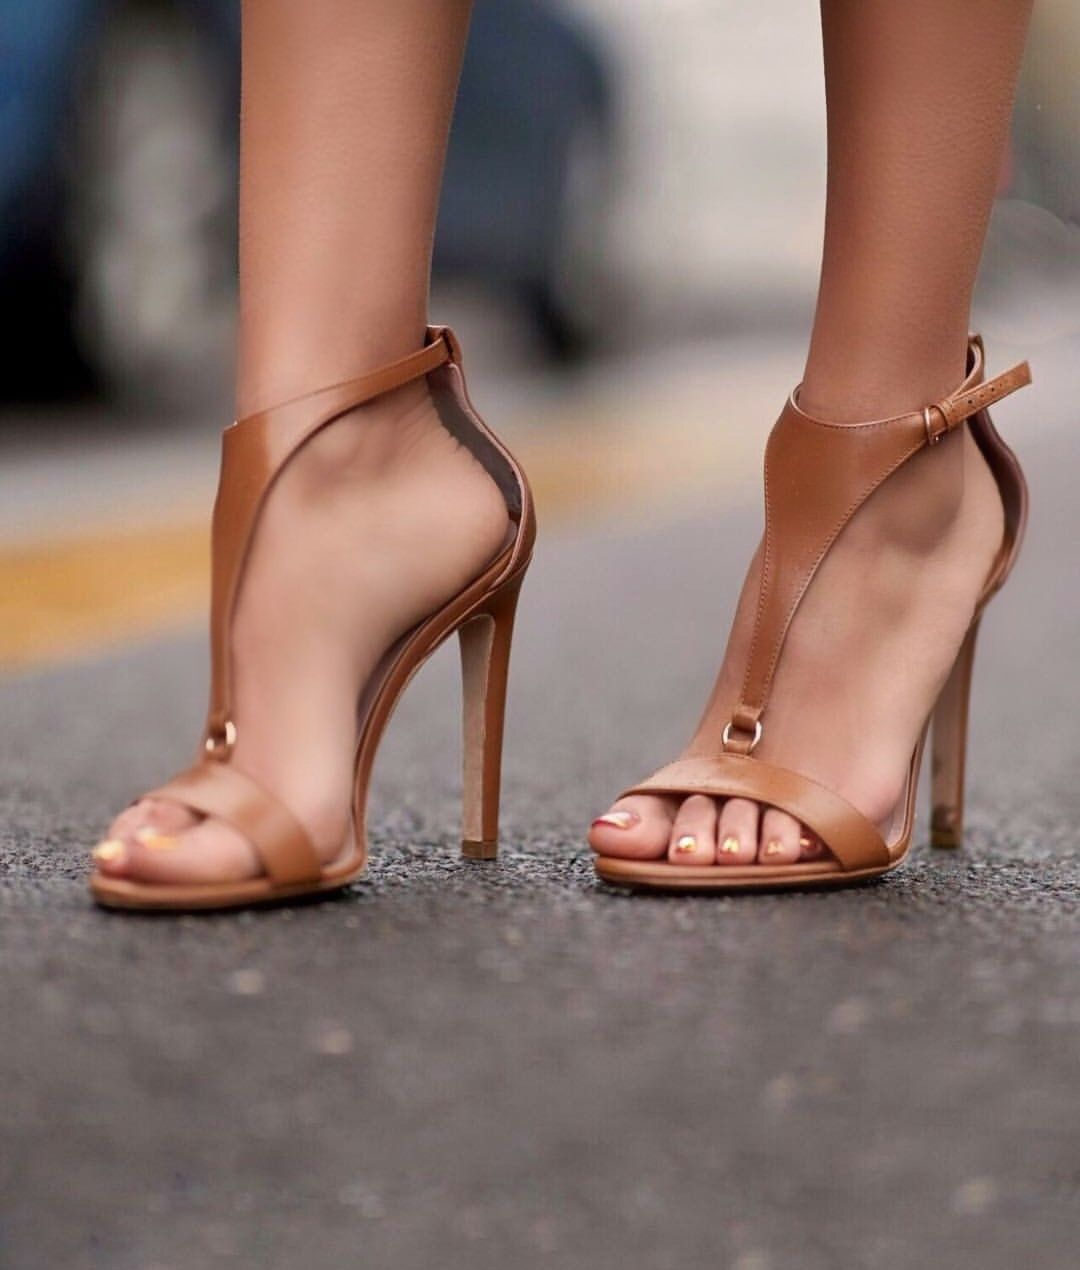 6b50ac336  fashion  style  womensfashion  womensoutfits  outfits Sandal Heels